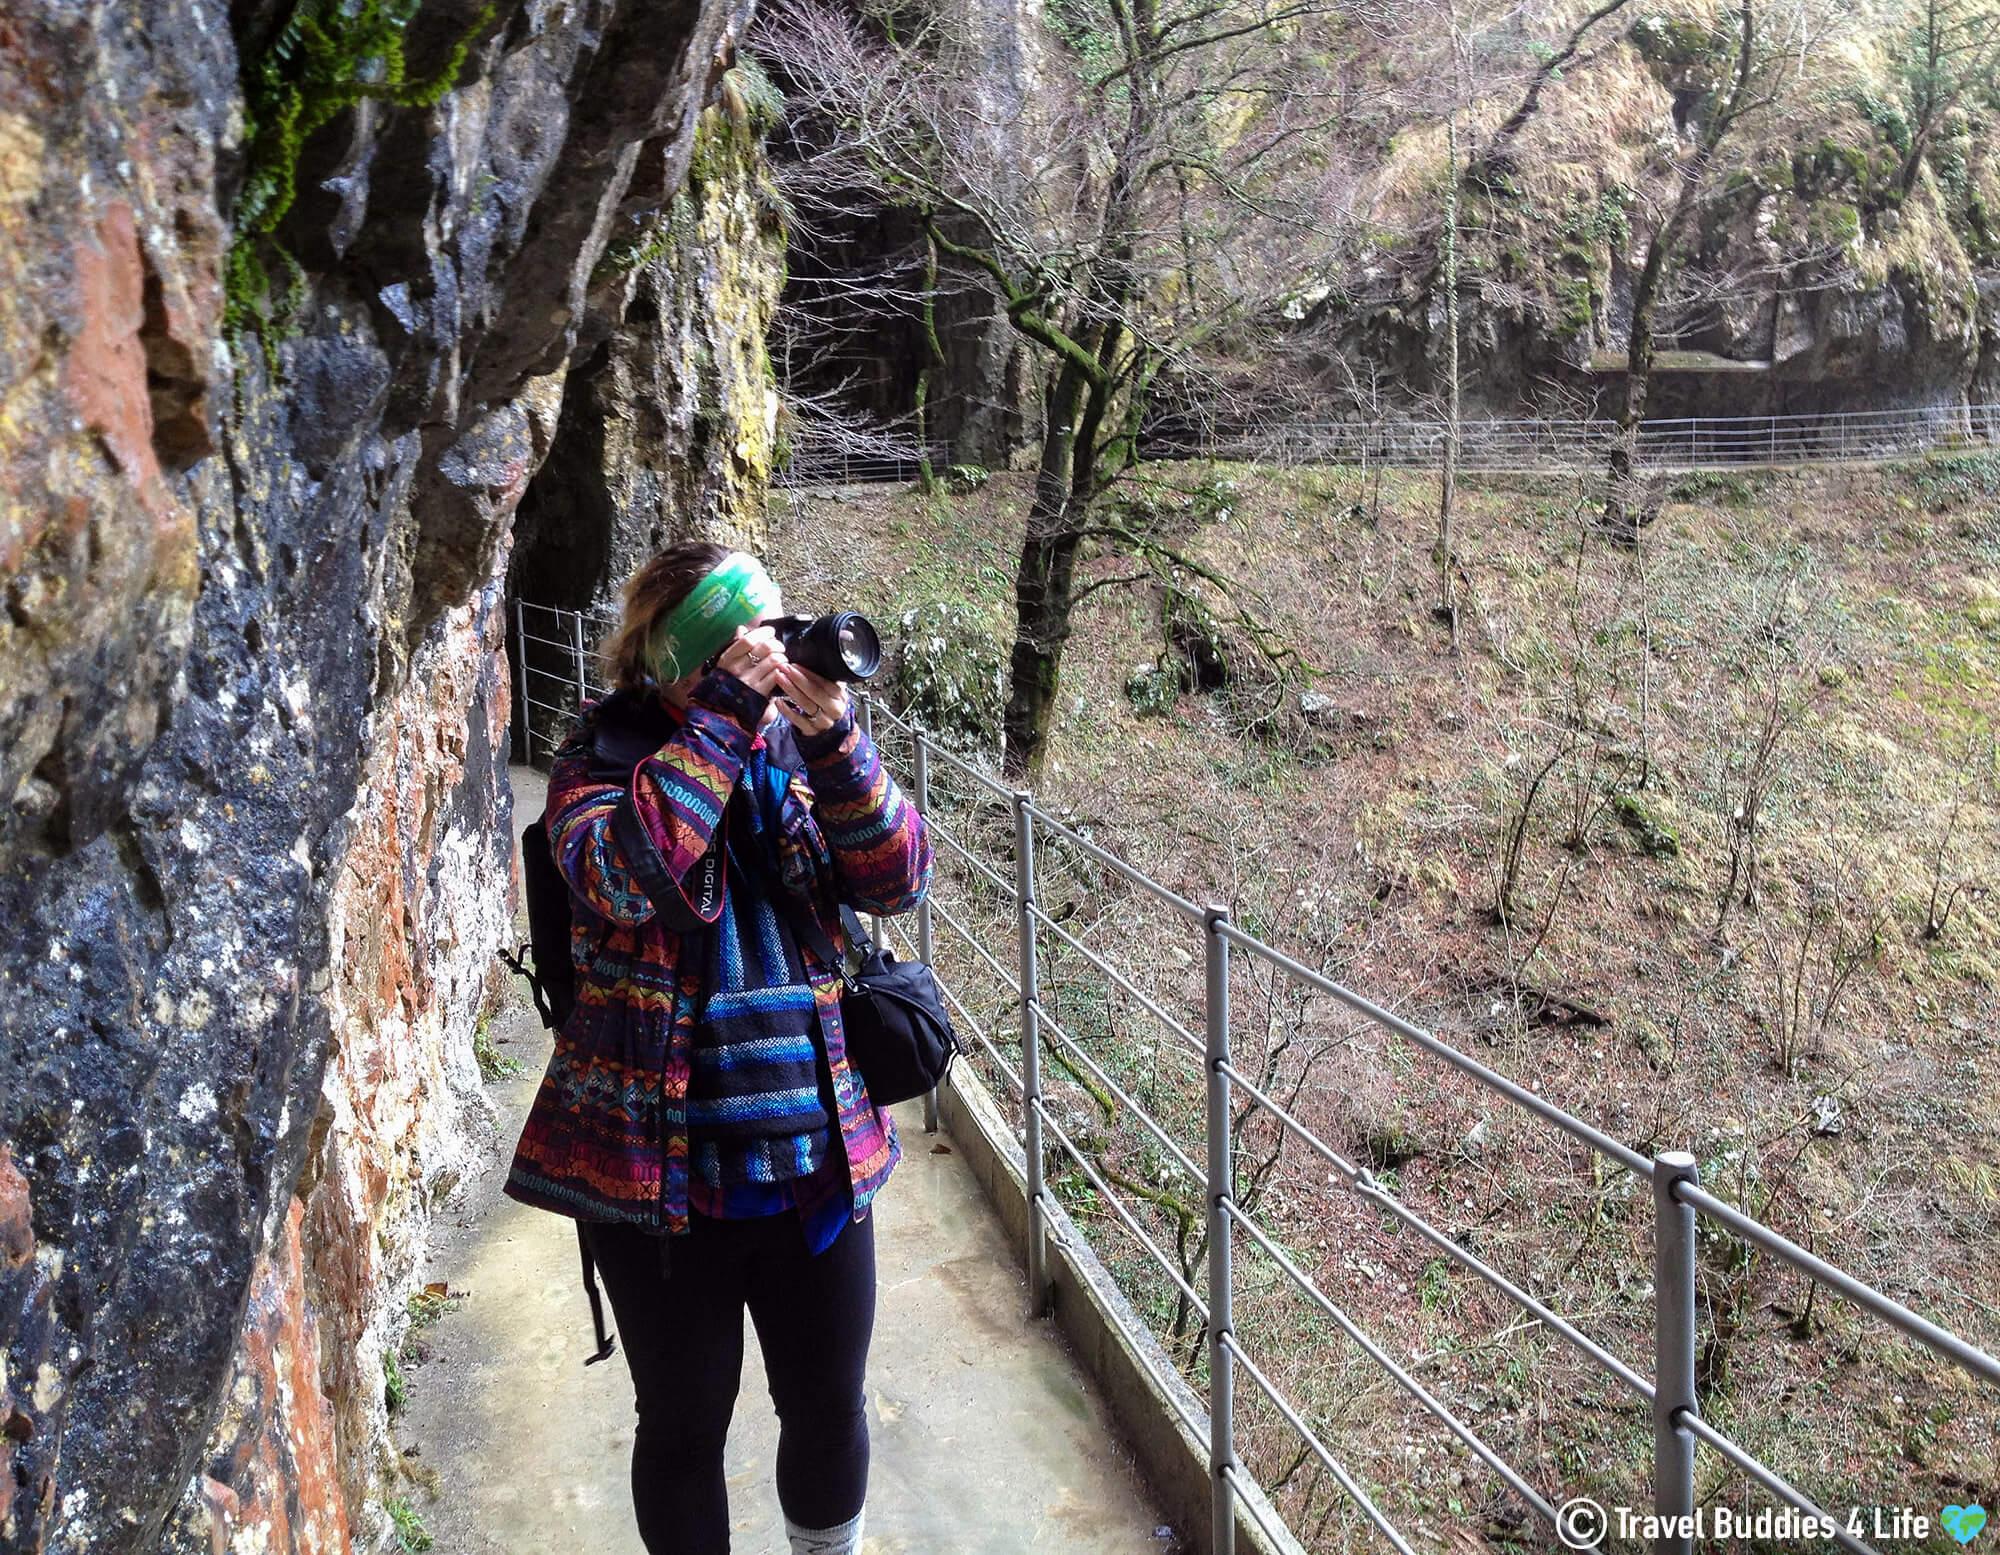 Ali Taking a Picture Outside of the Skocjanske Jame Caves of Slovenia's Karst Region, in Europe's Balkan Countries